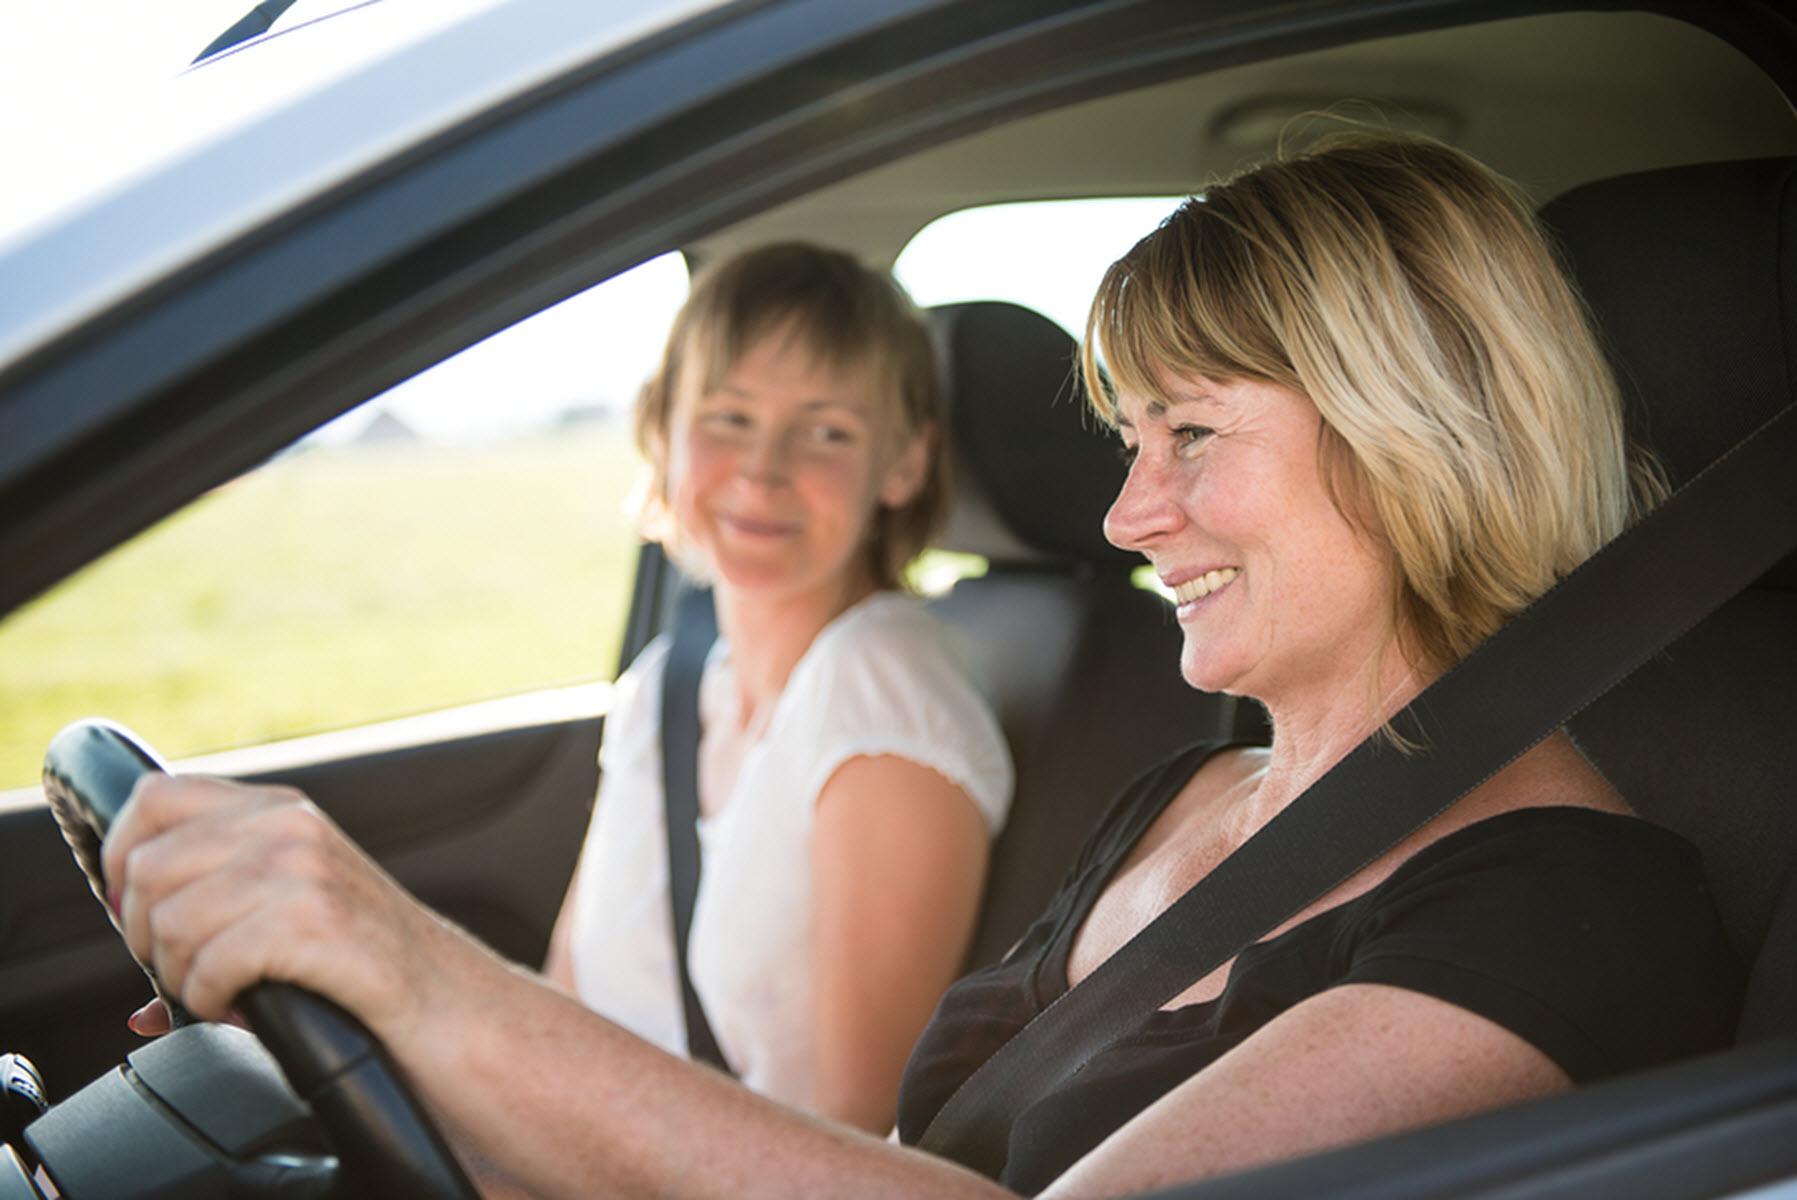 Home Care Services in Elizabeth PA: Transportation Alternatives